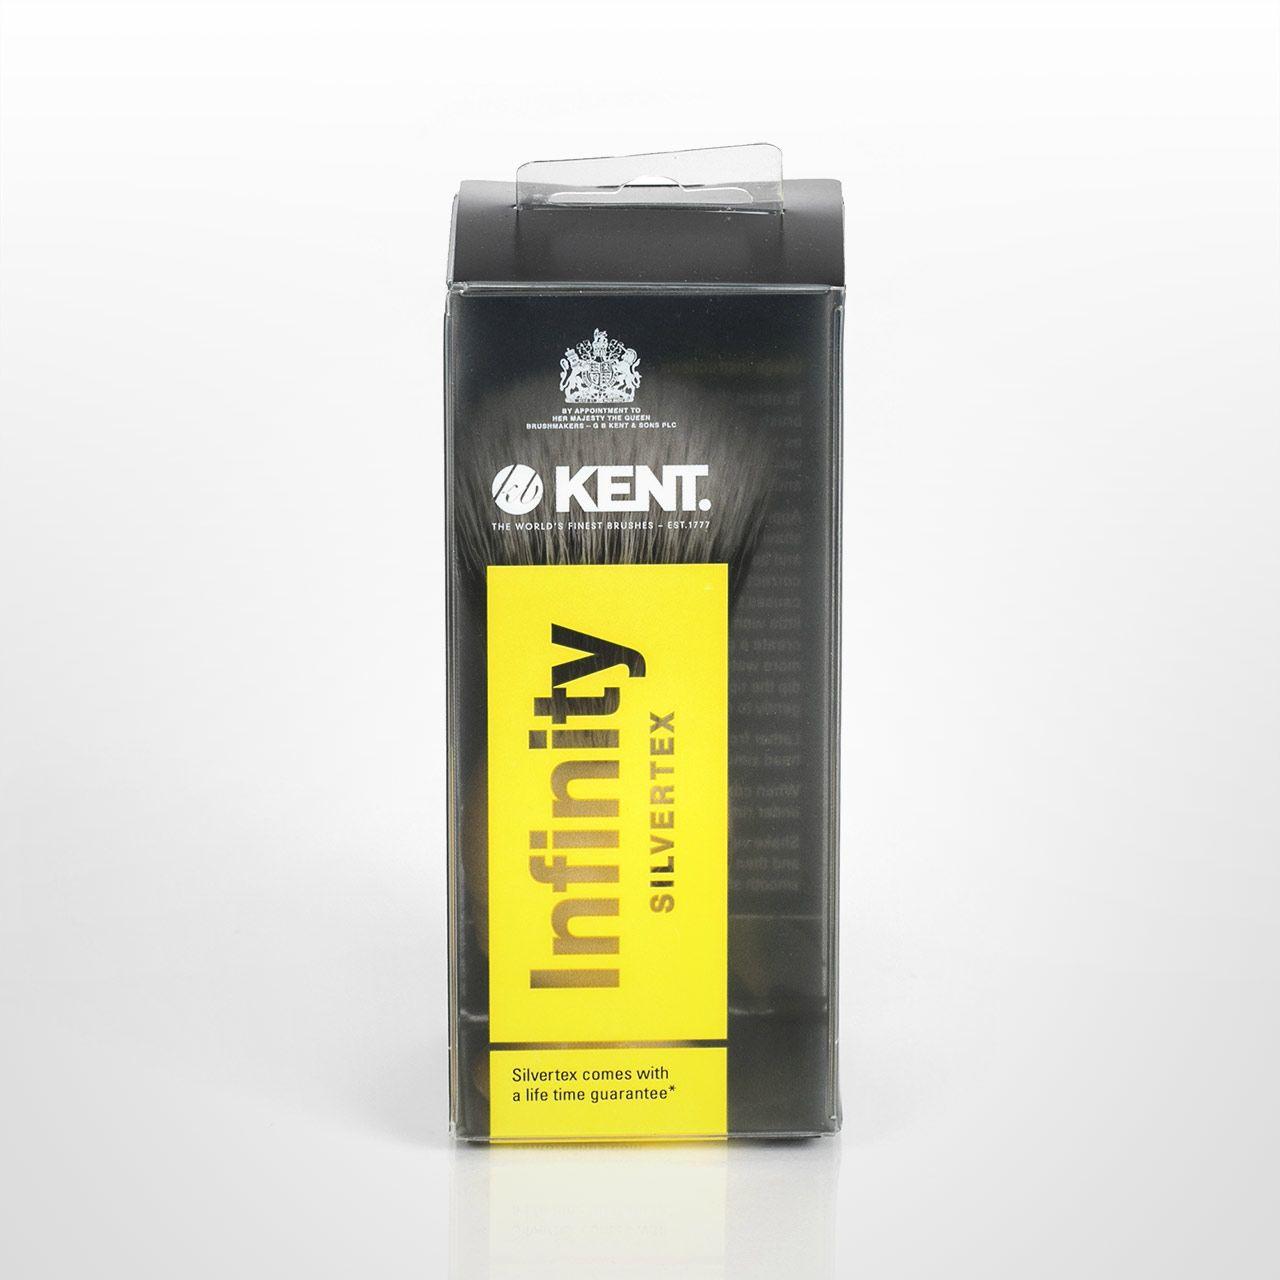 Opakowanie pędzla do golenia Kent Infinity Shaving Brush